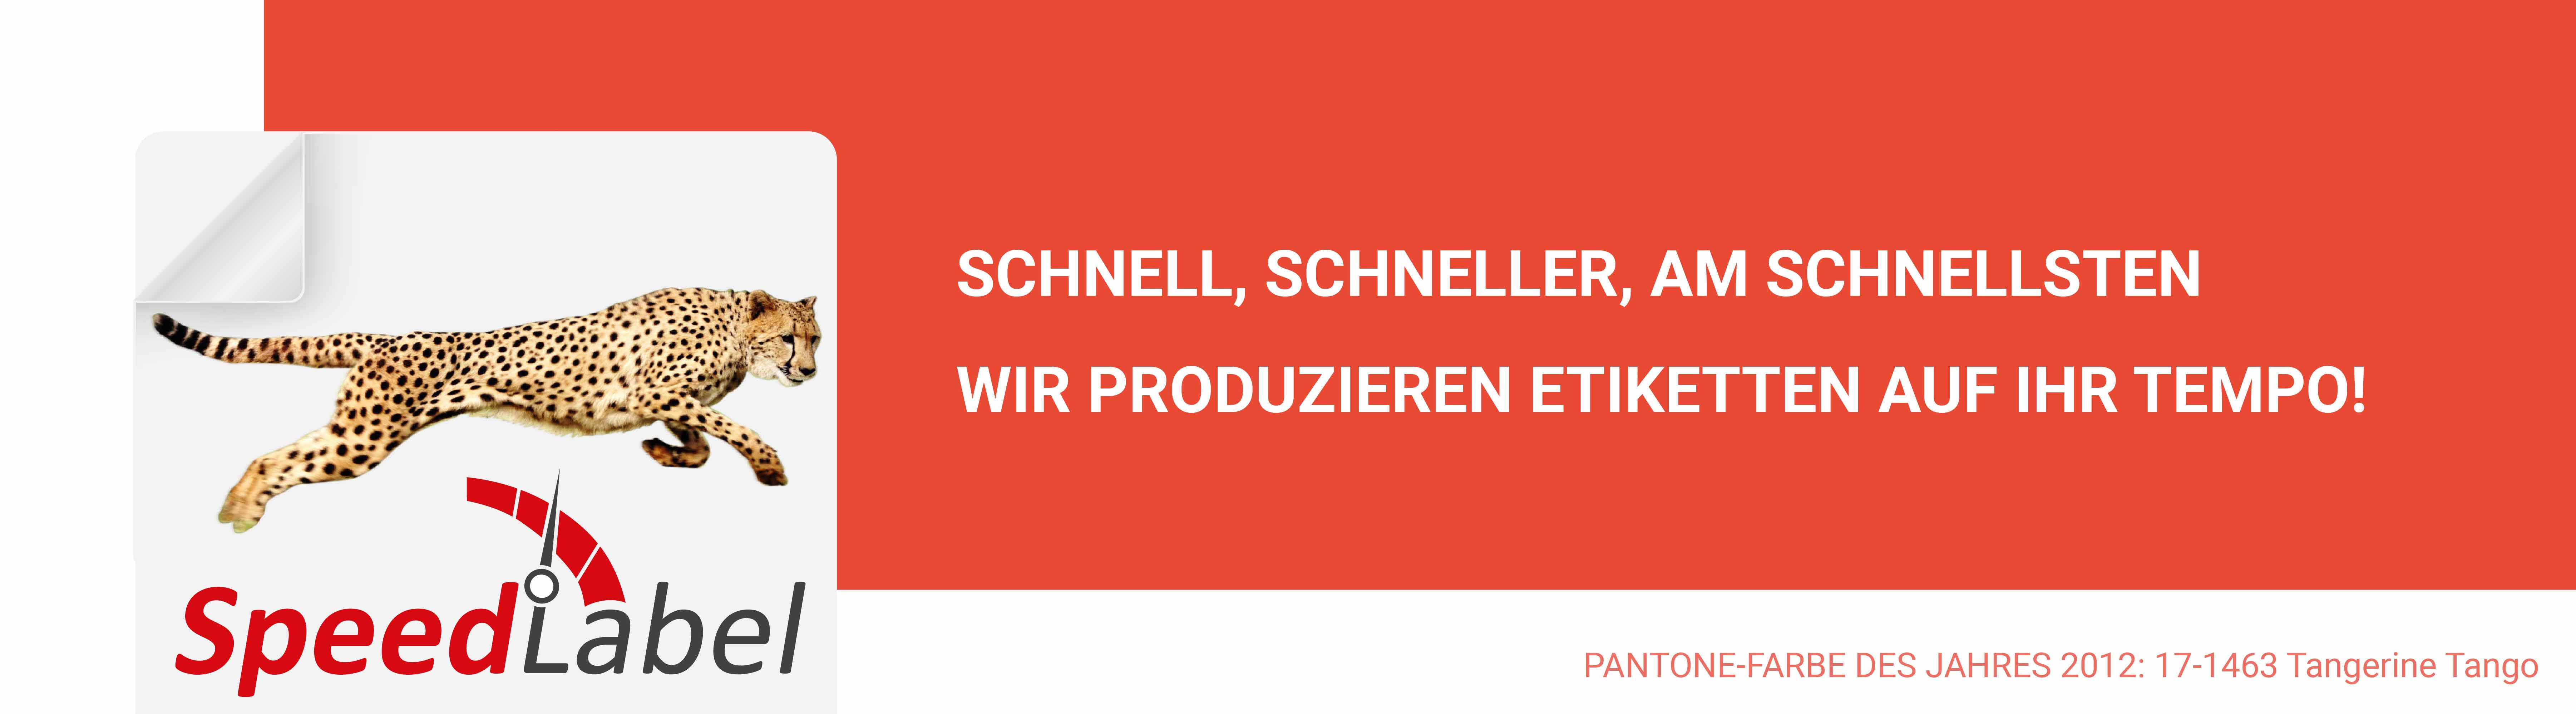 Innovastore International SPEEDLABEL Germany